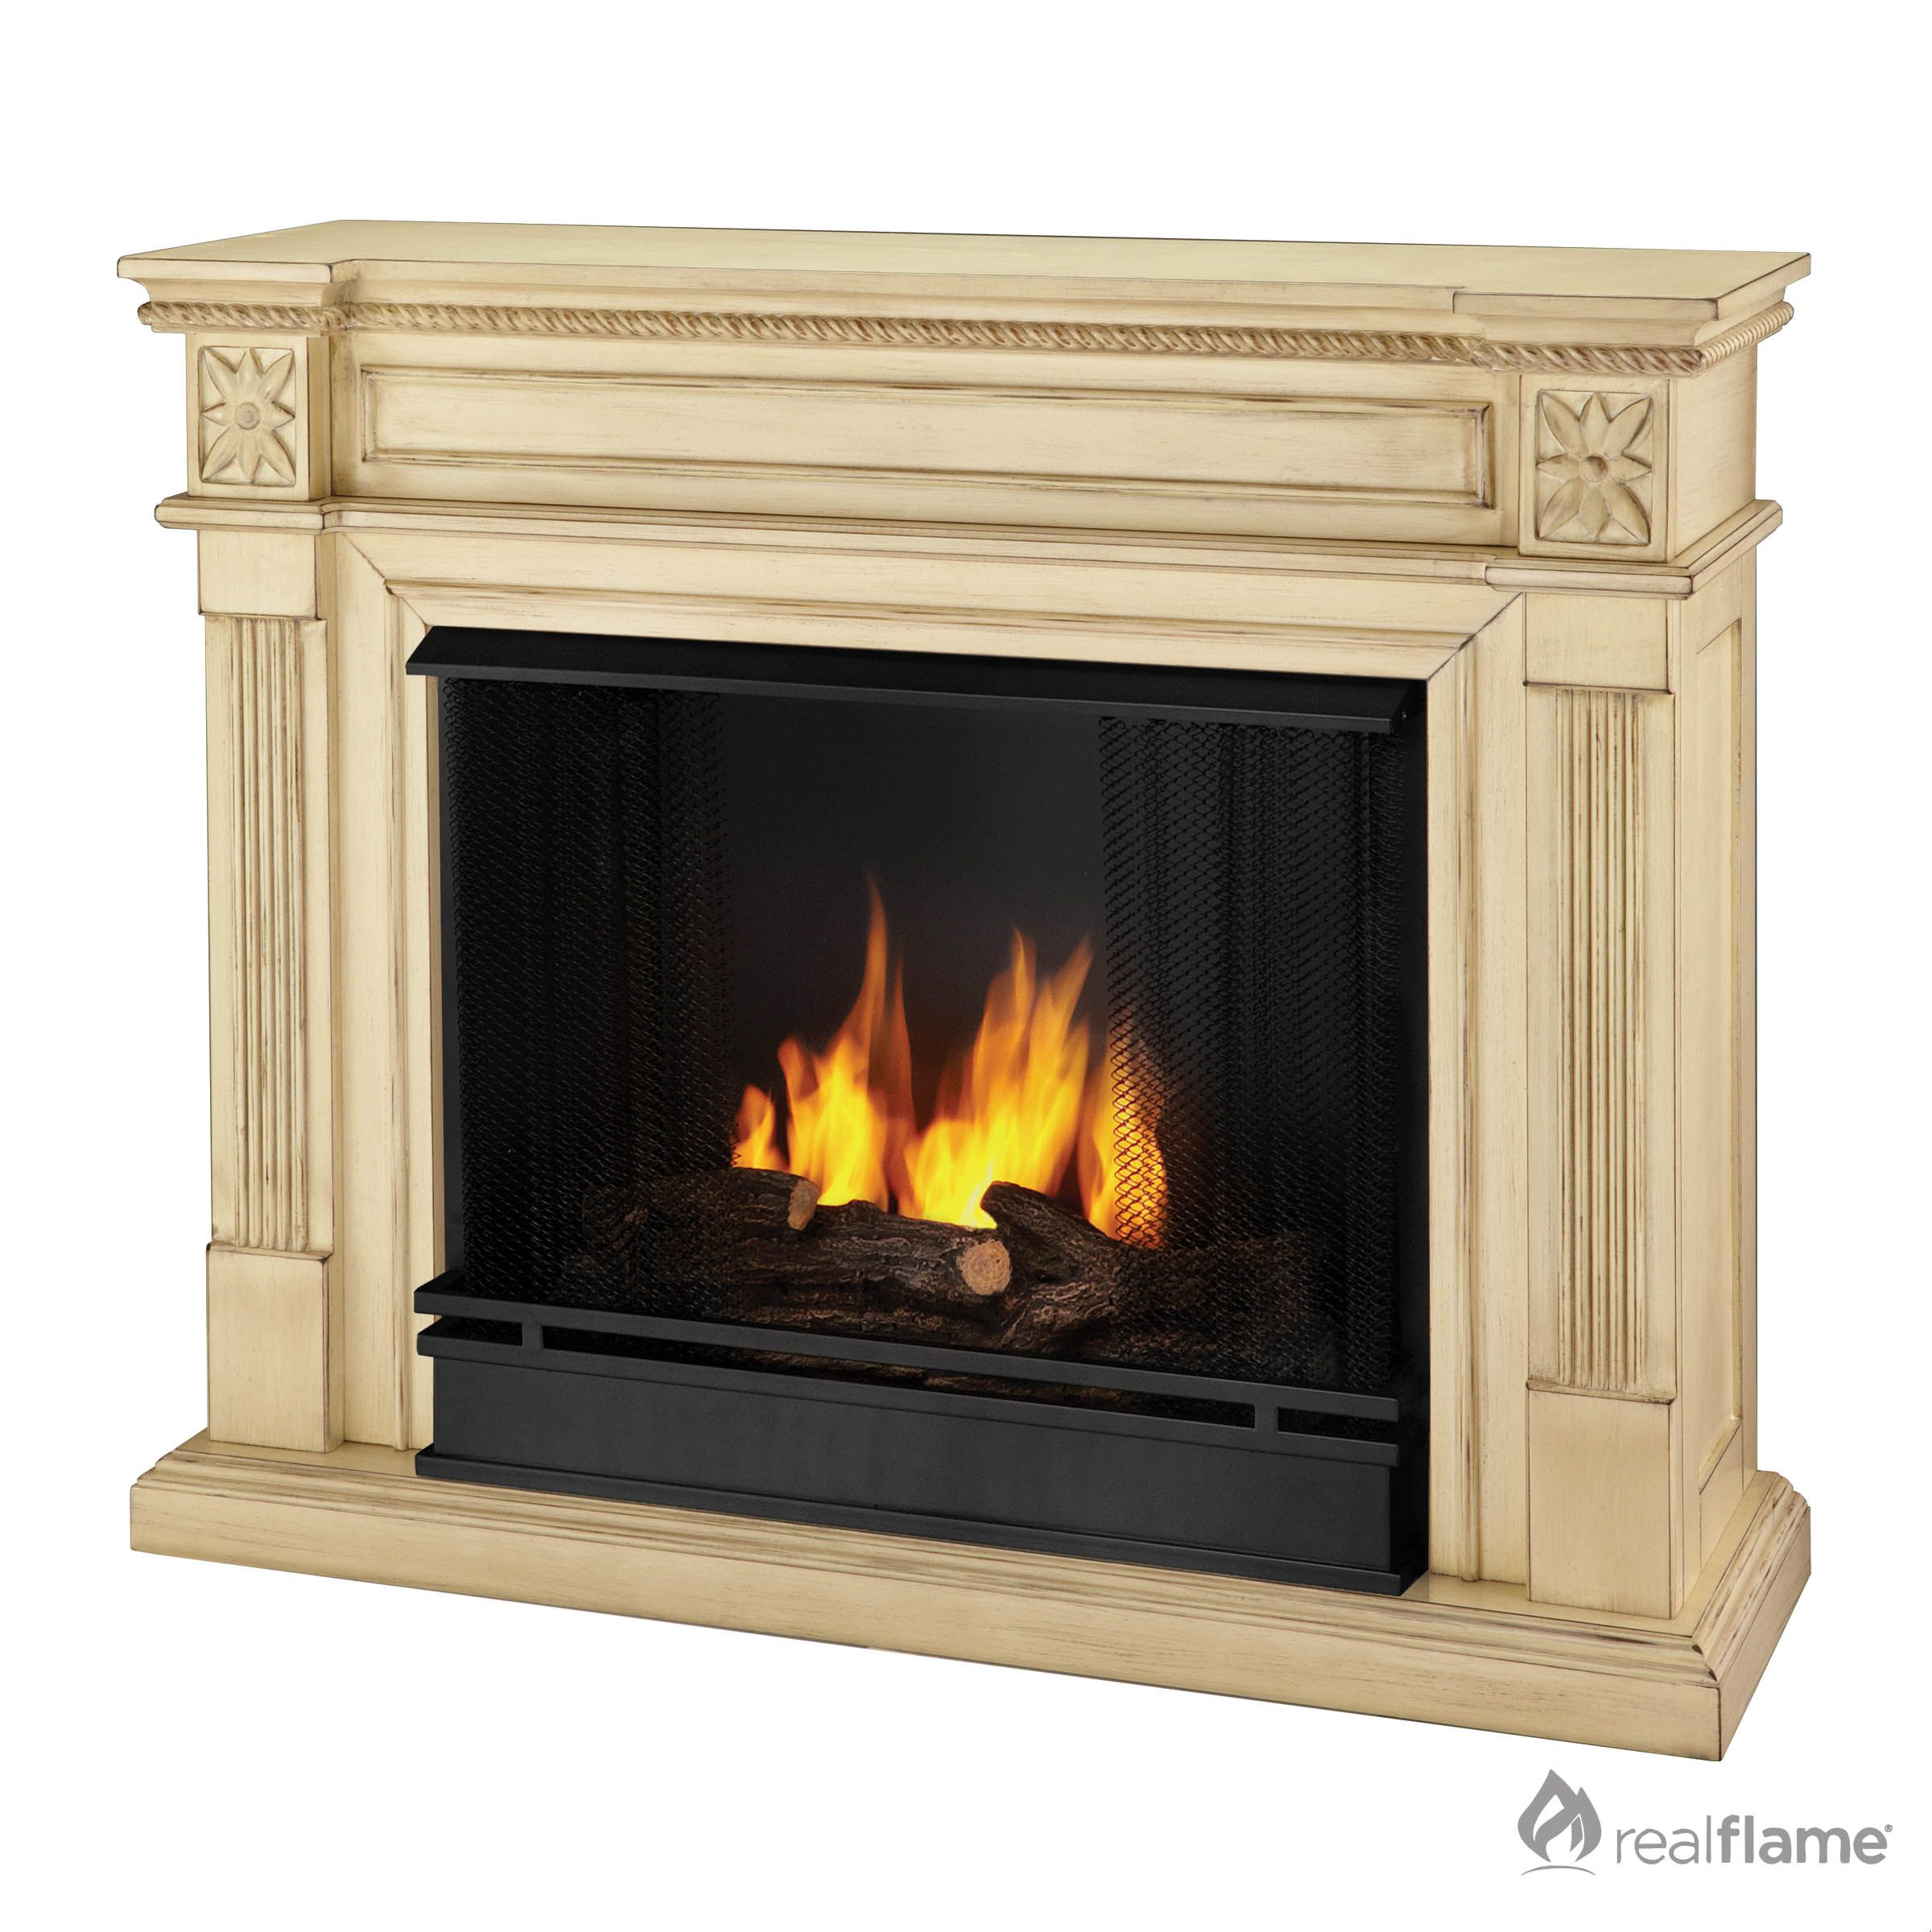 real flame gel fuel antique white fireplace solid wood veneer